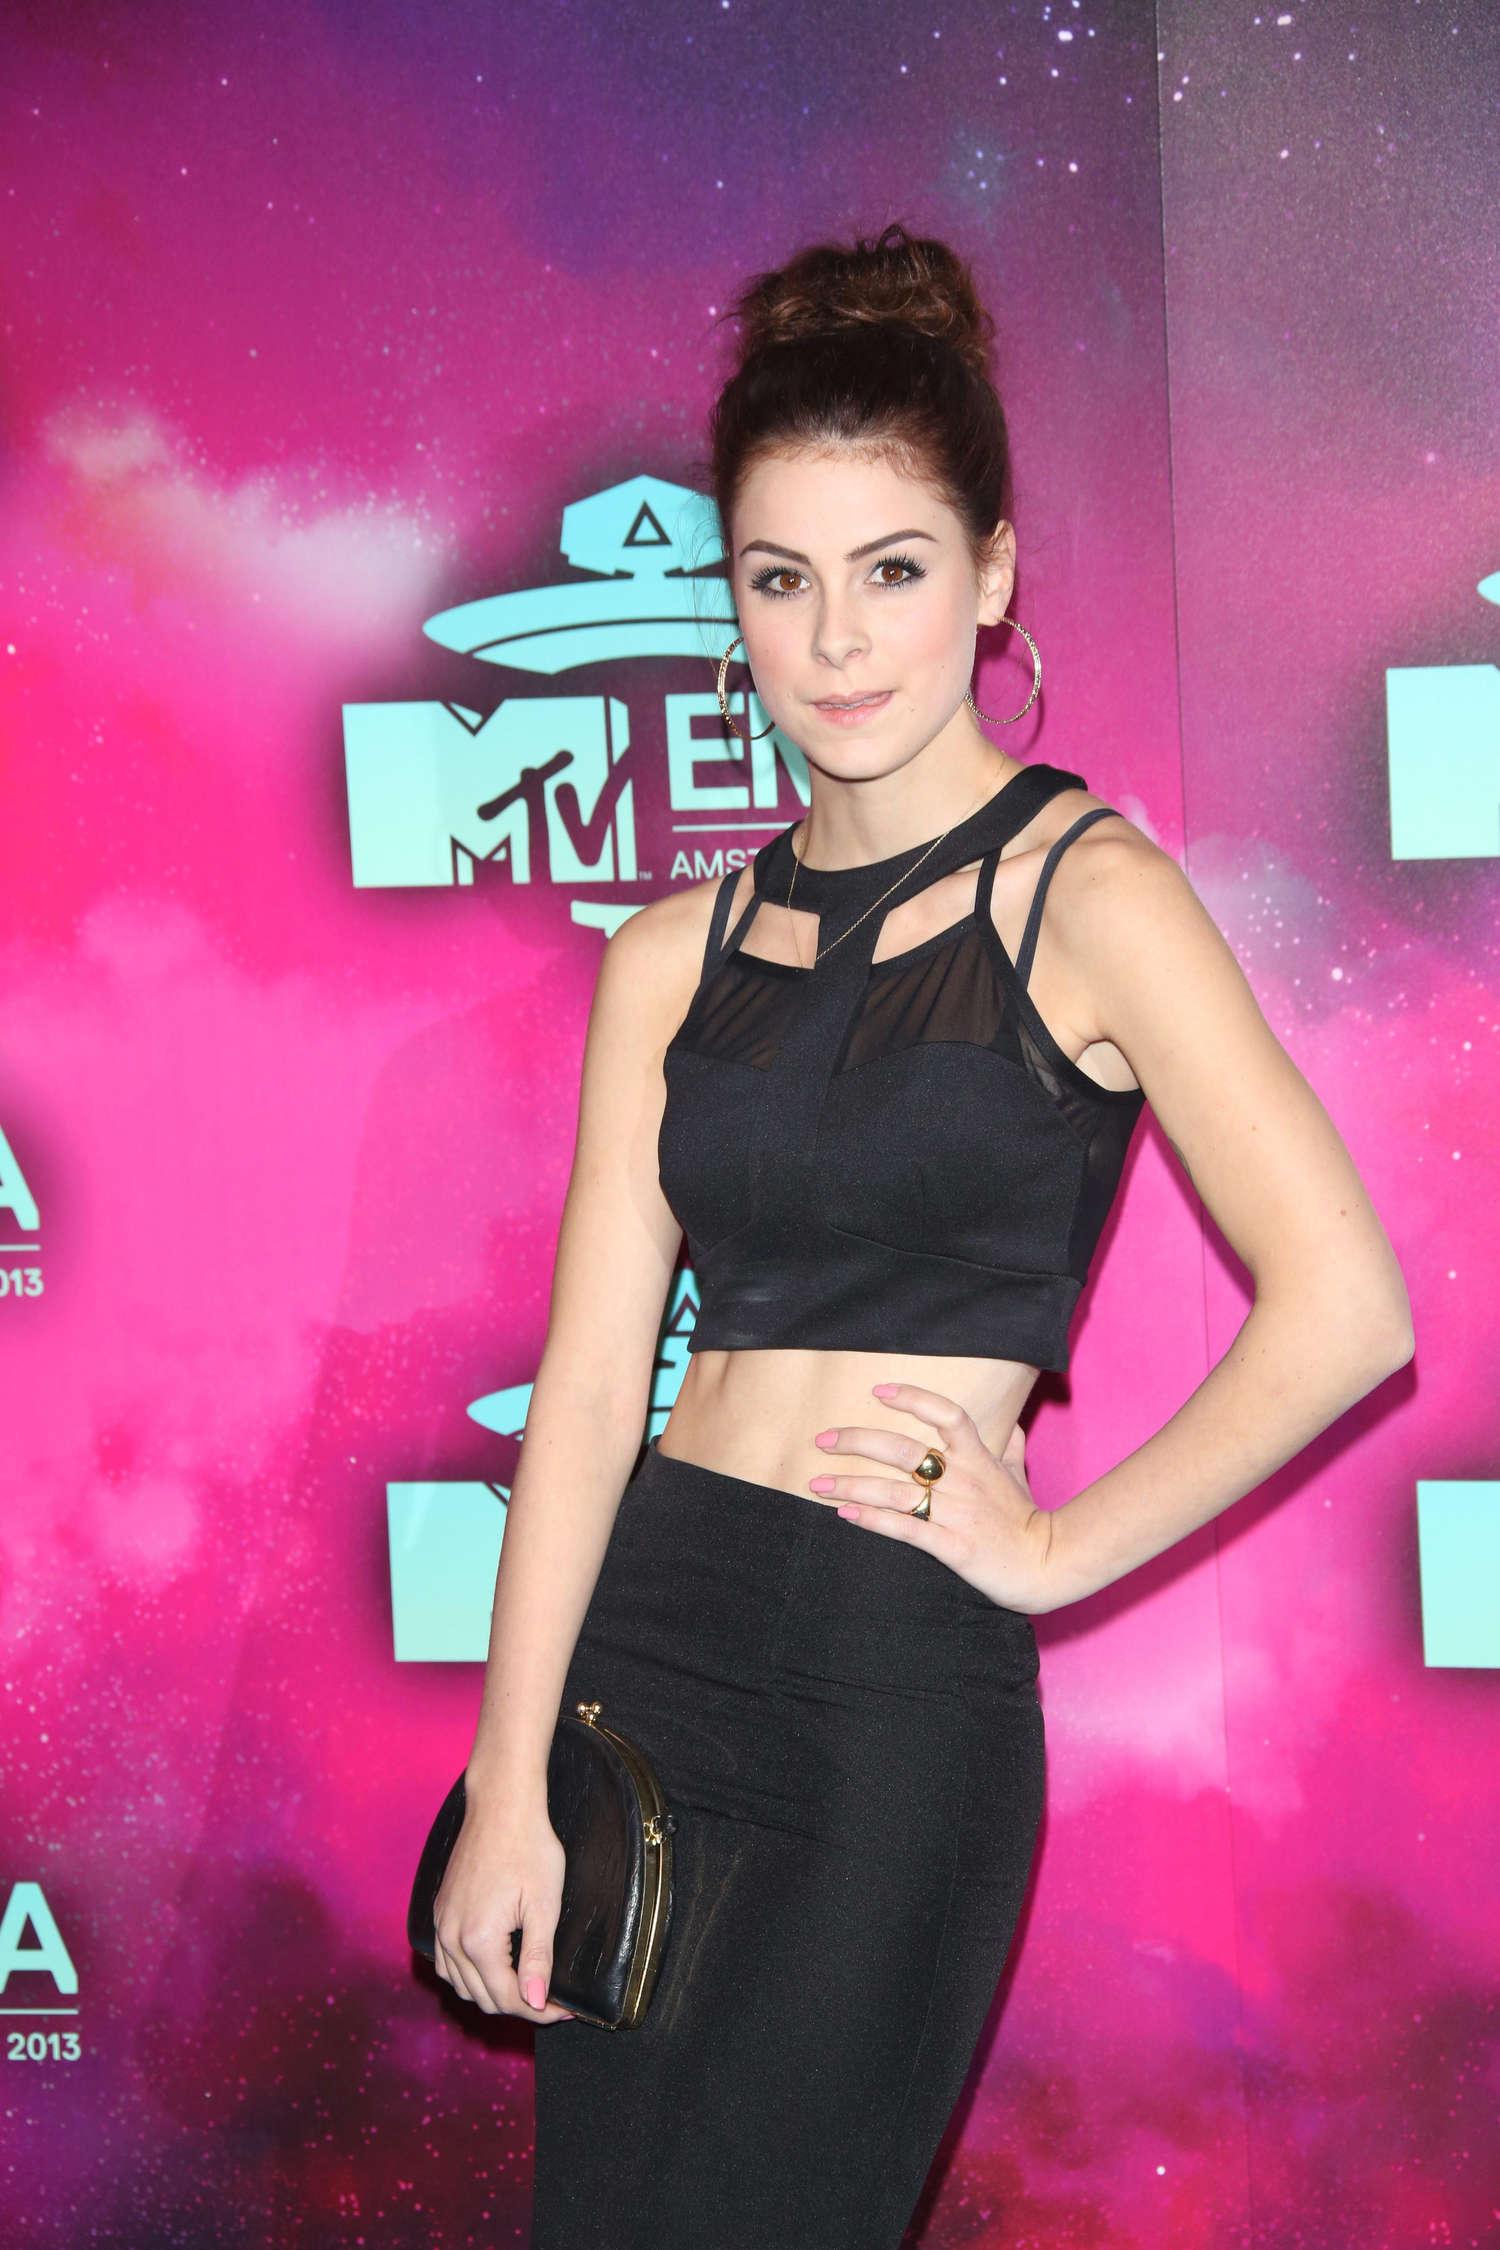 Lena Meyer Landrut: 2013 MTV EMA -09 - GotCeleb